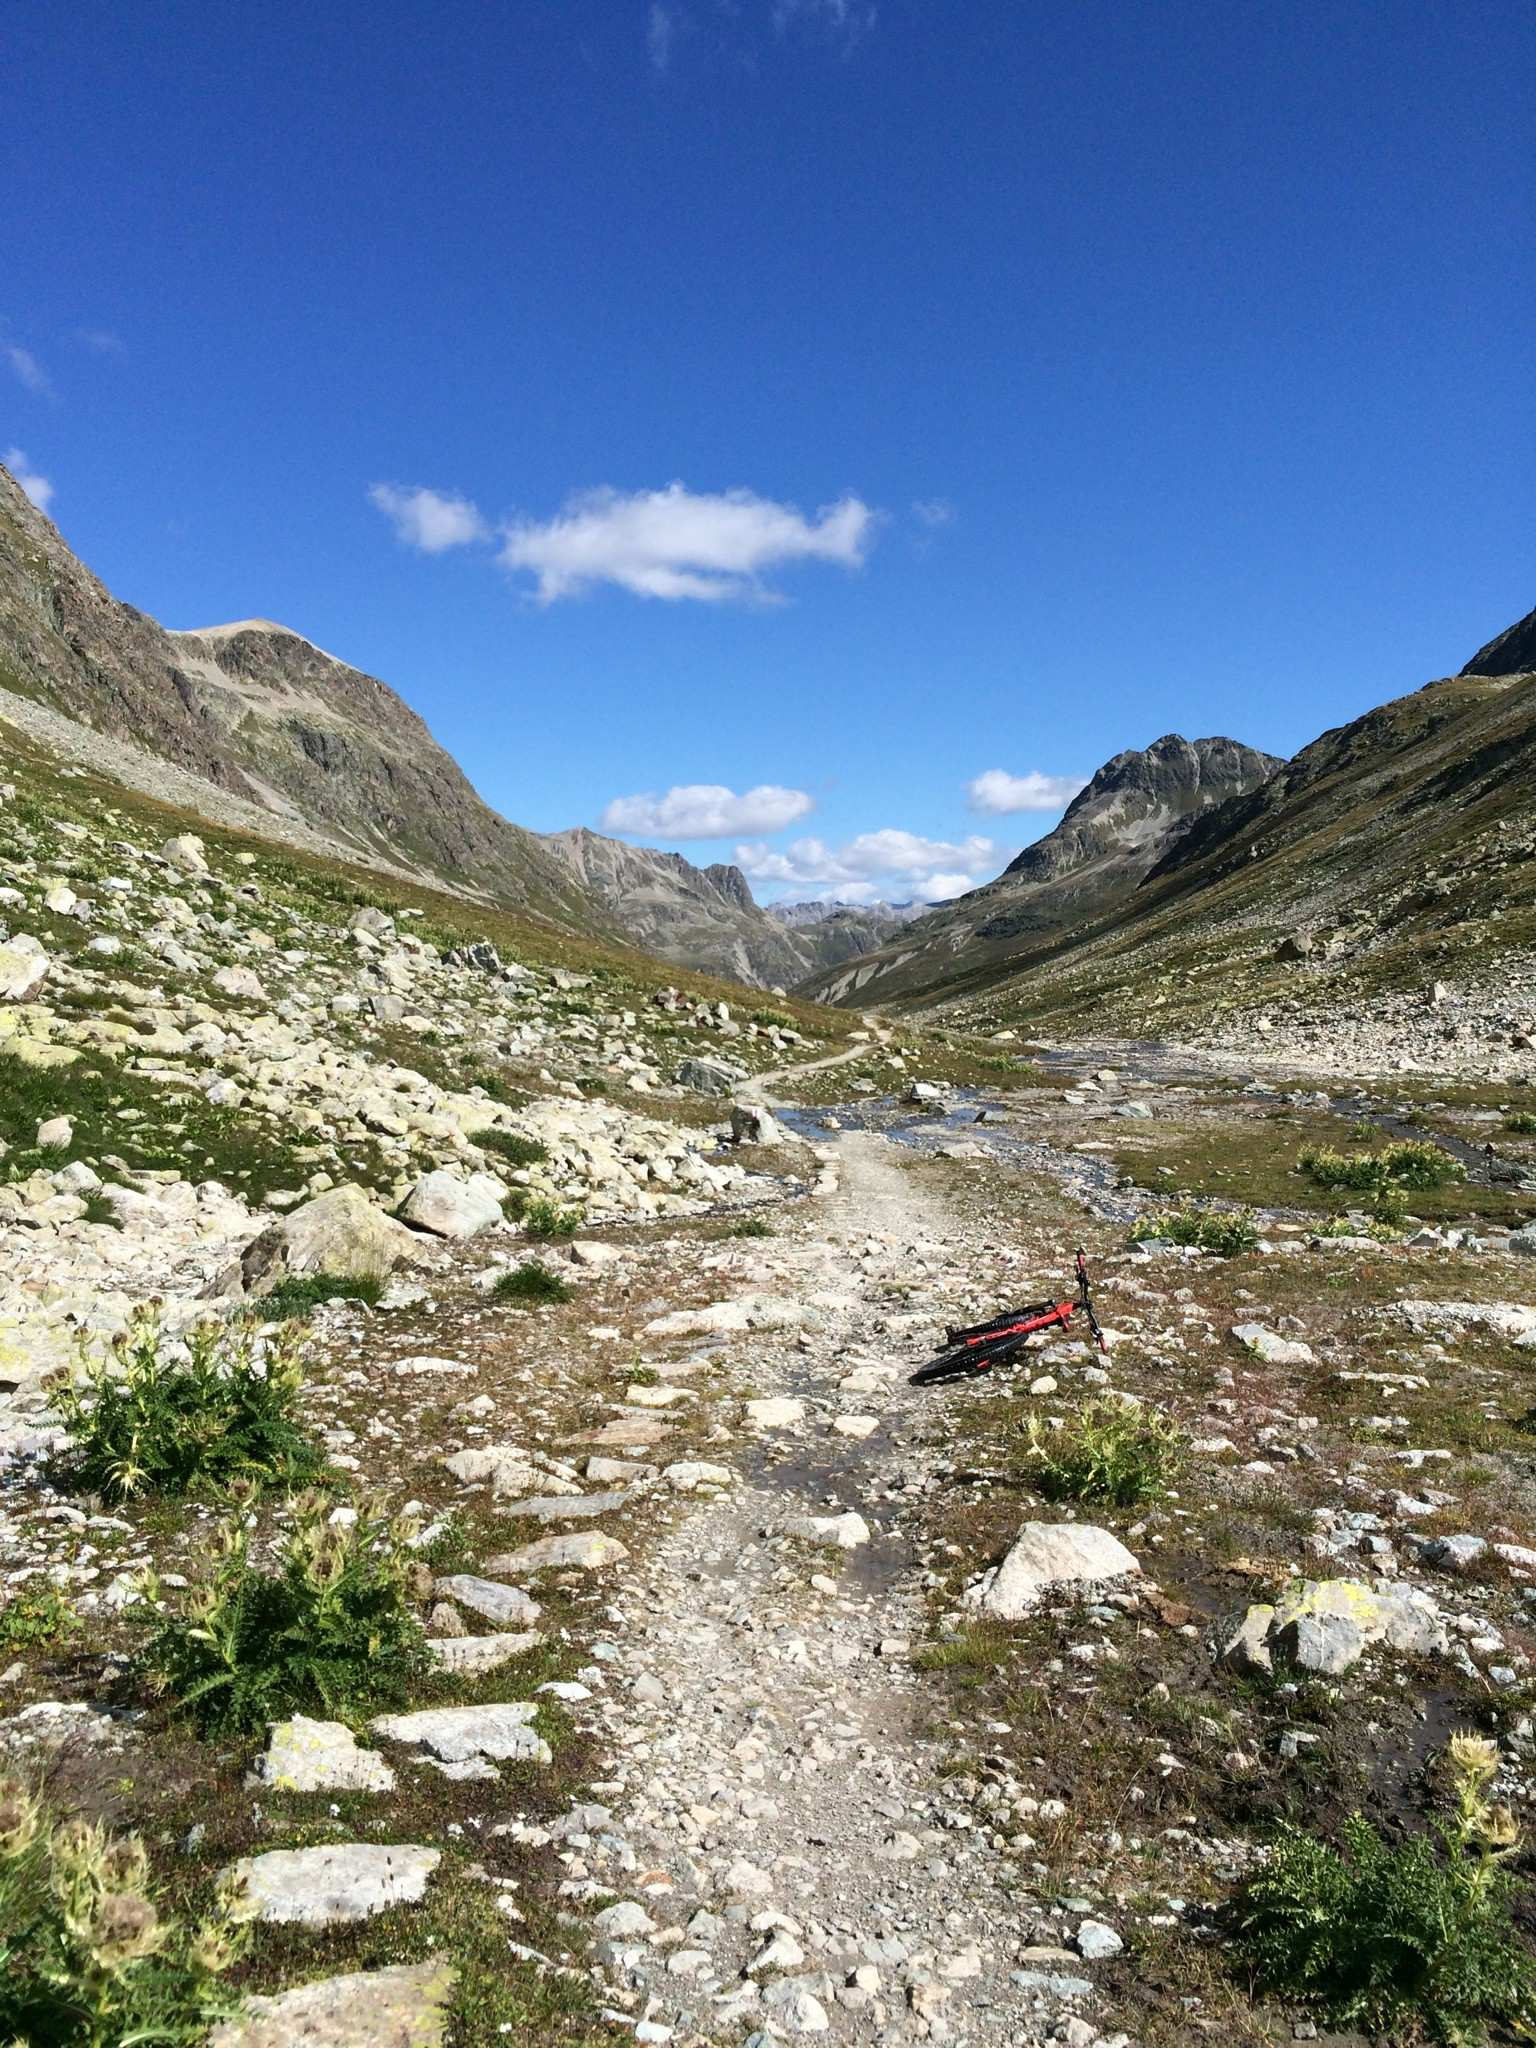 Mountain Bike Trails in Switzerland